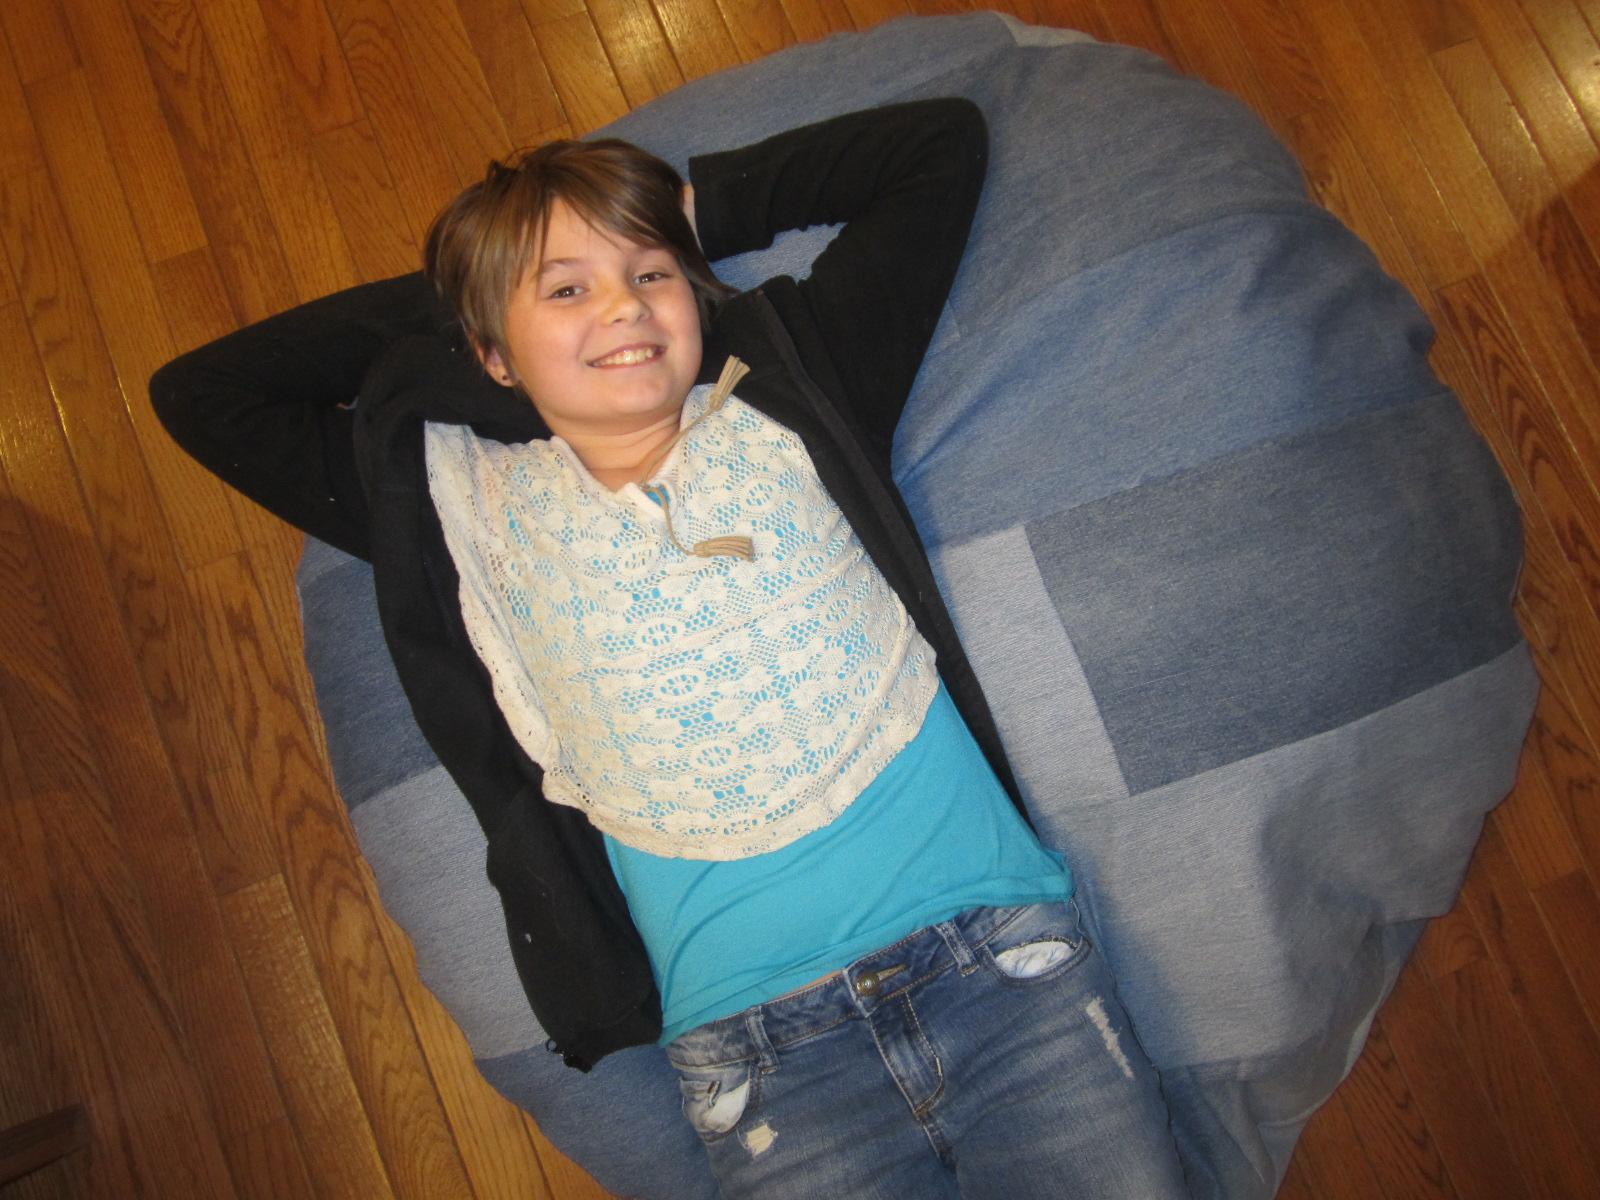 Nora tests the new Huggle Pod cushion